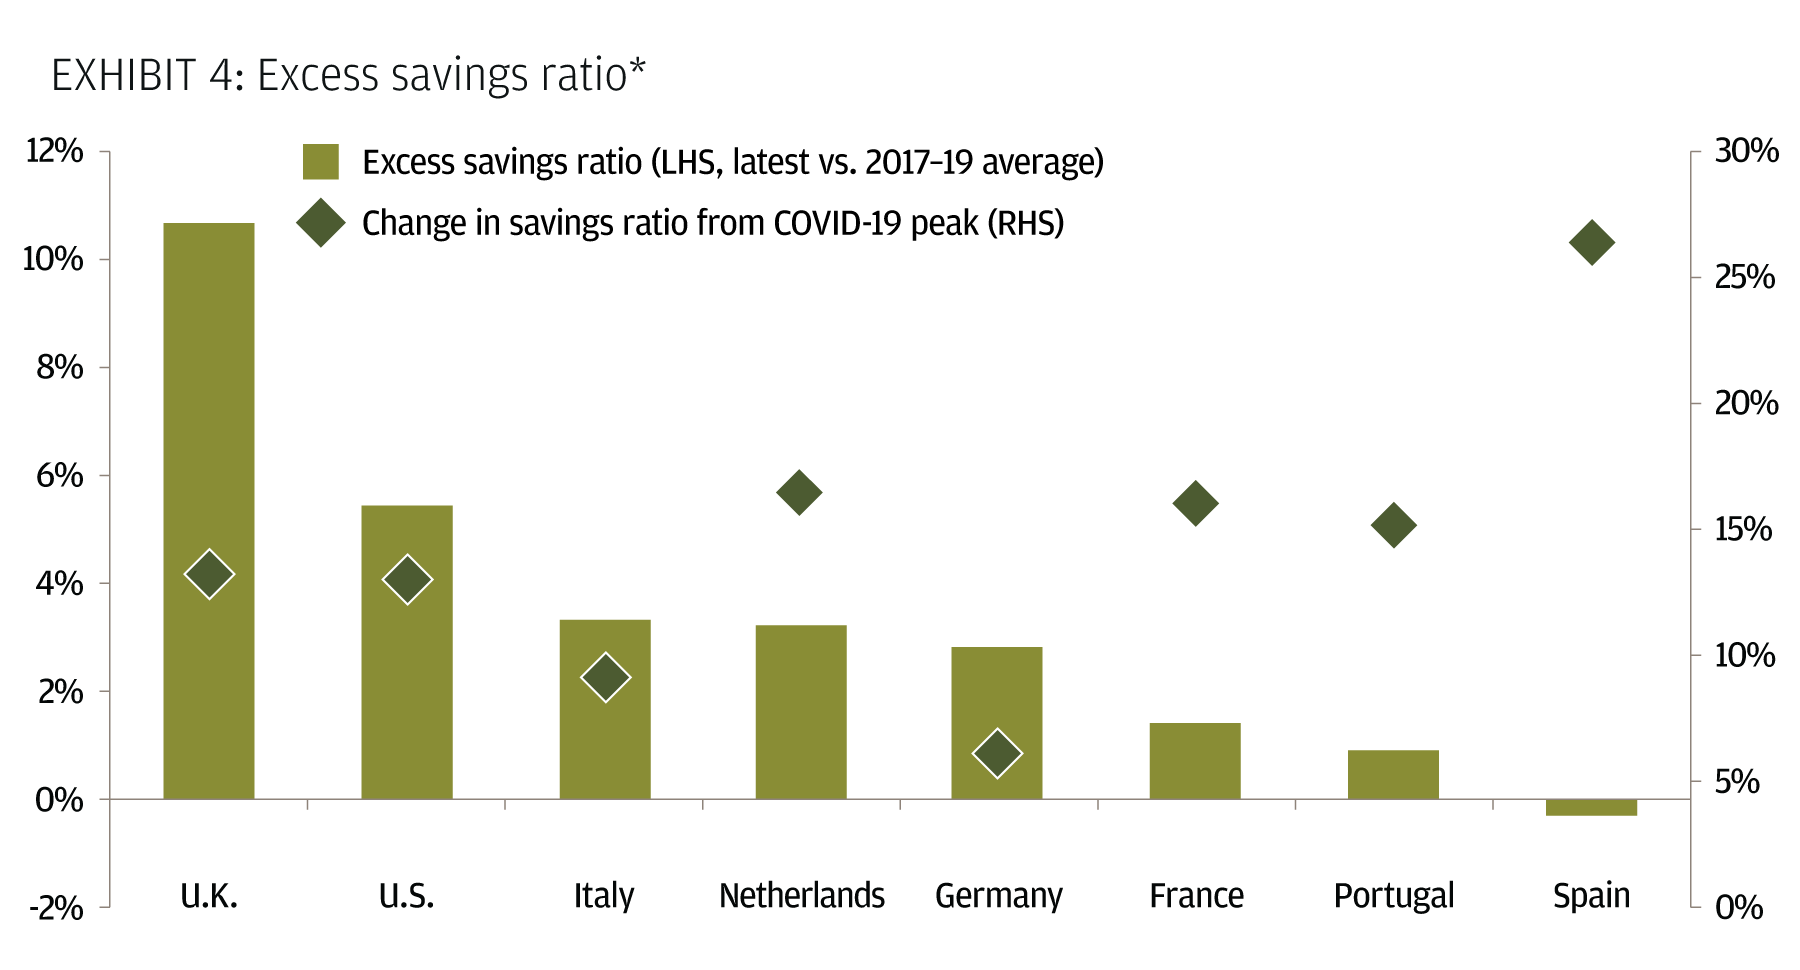 Excess savings ratio